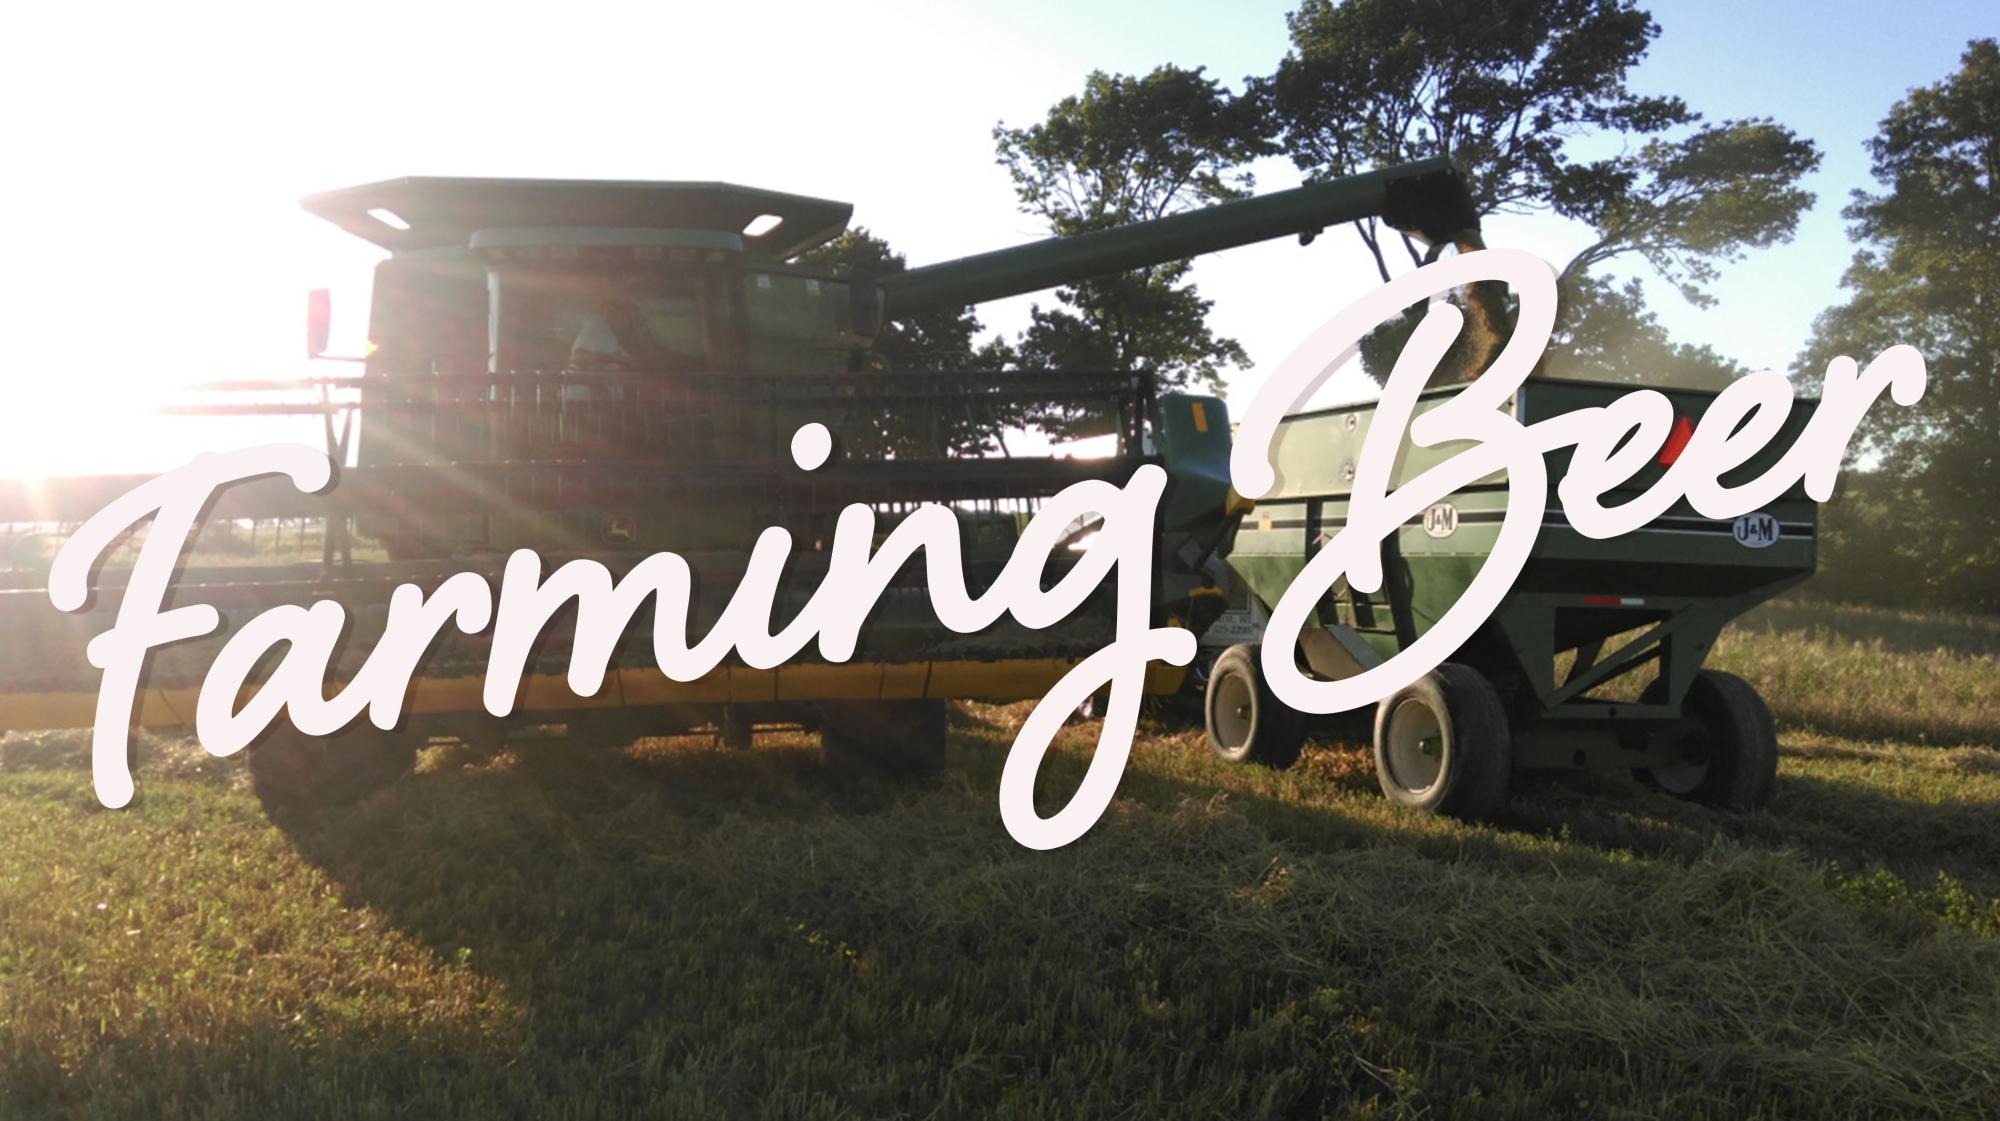 Farming Beer